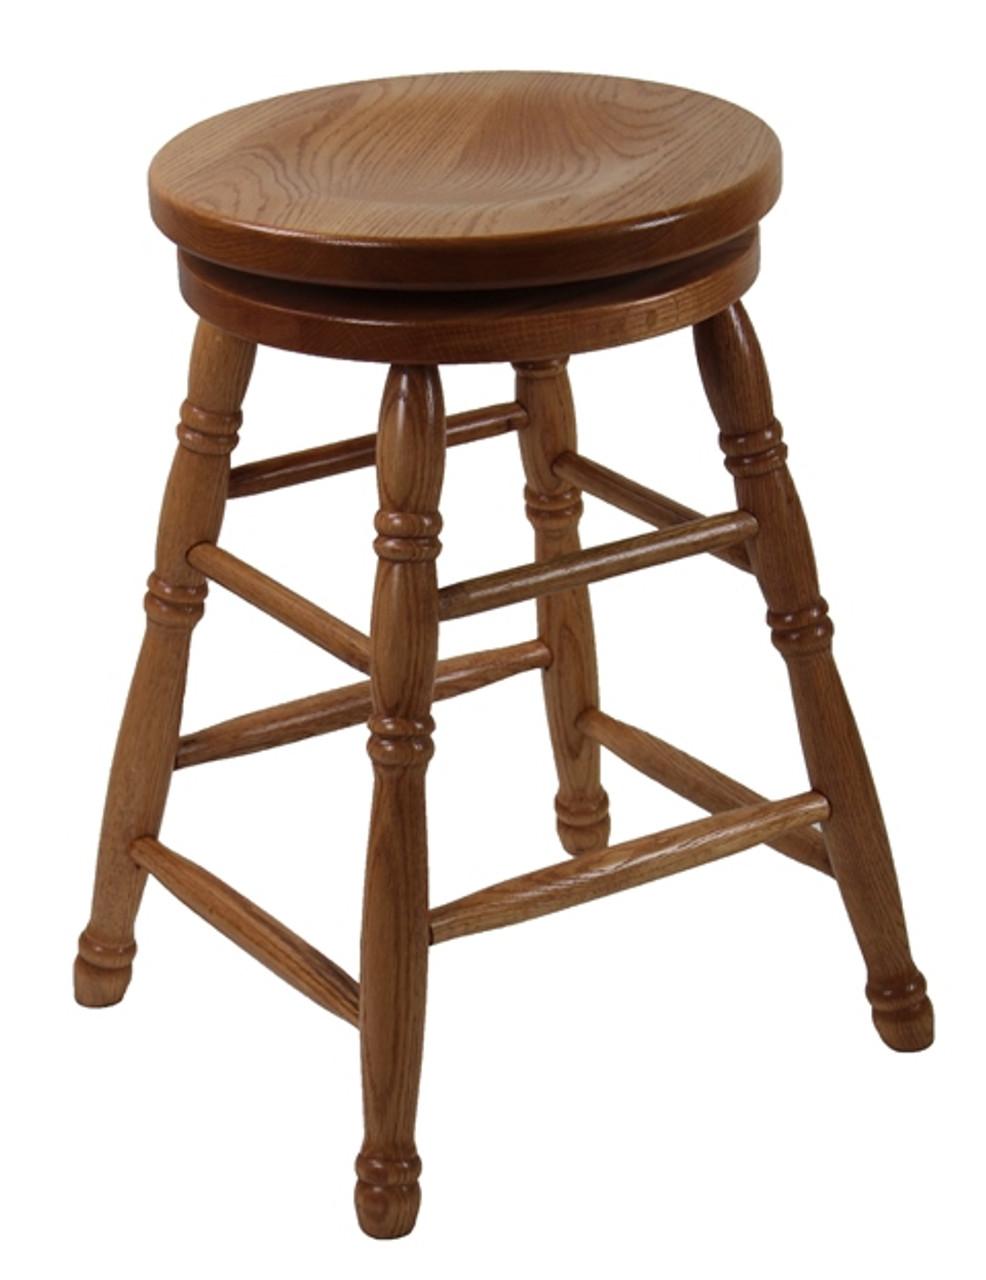 Fabulous Pio 24 Swivel Round Top Barstool Ibusinesslaw Wood Chair Design Ideas Ibusinesslaworg